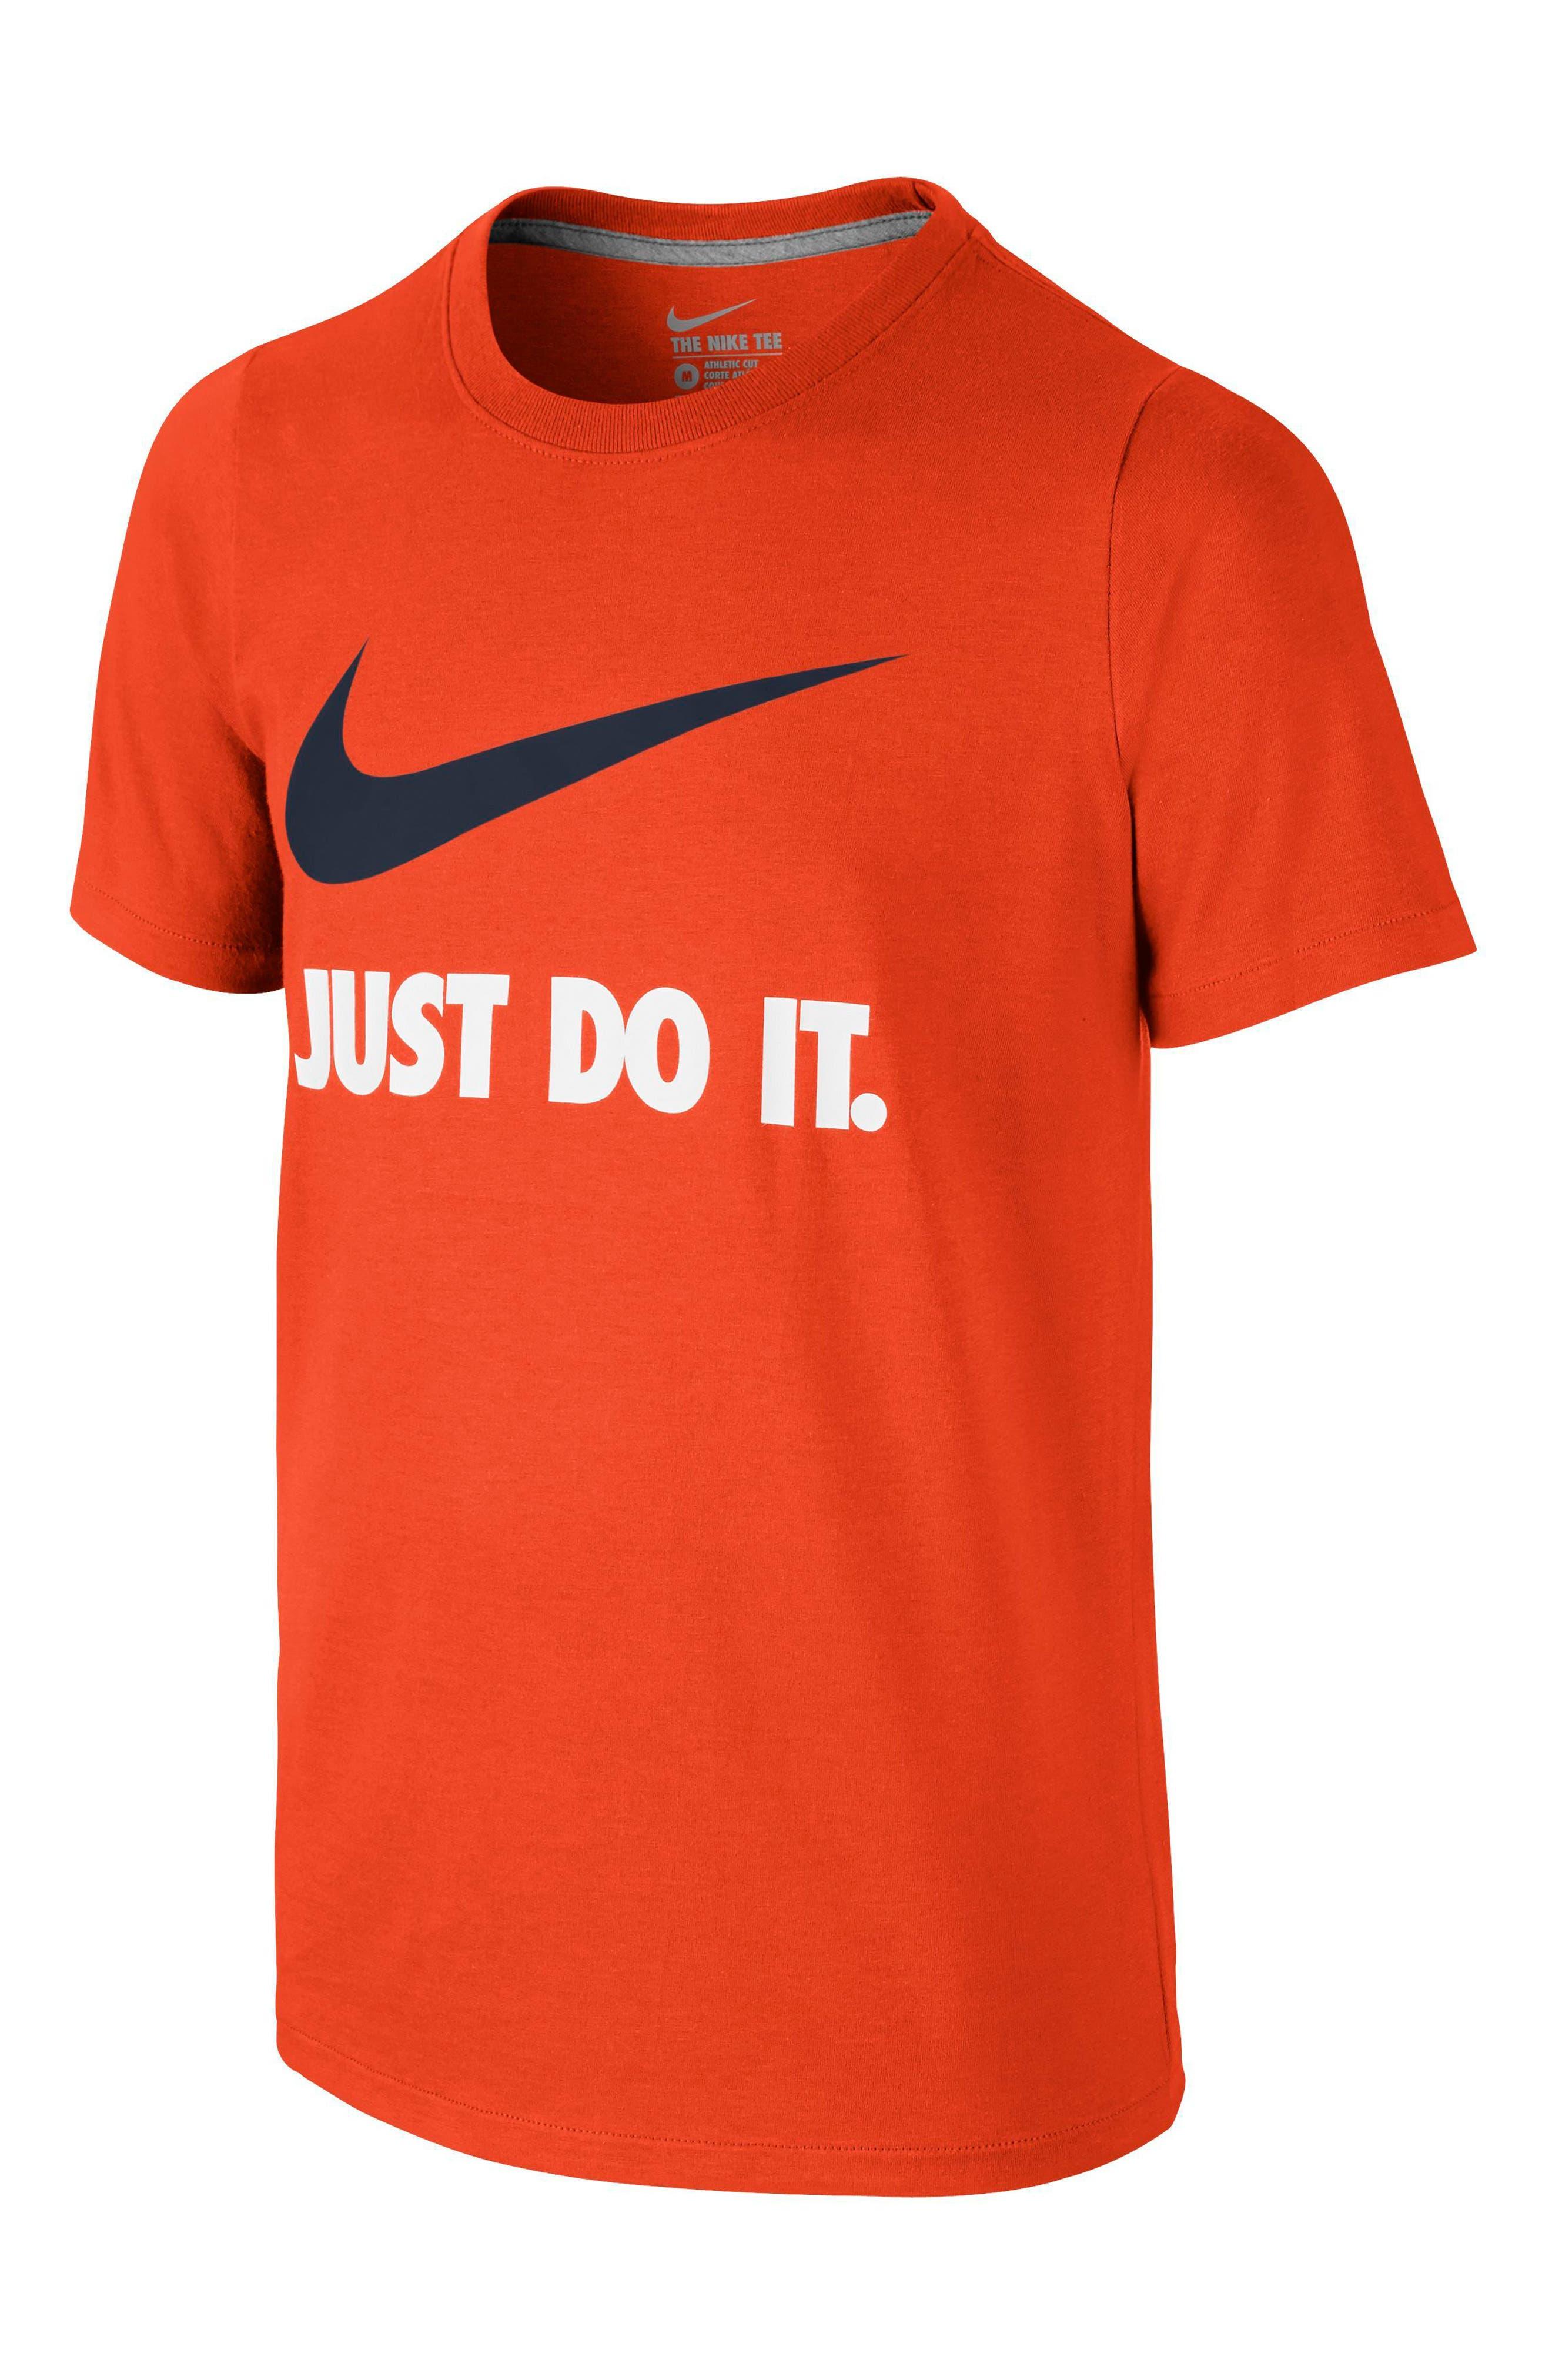 Alternate Image 1 Selected - Nike Just Do It Cotton T-Shirt (Little Boys & Big Boys)